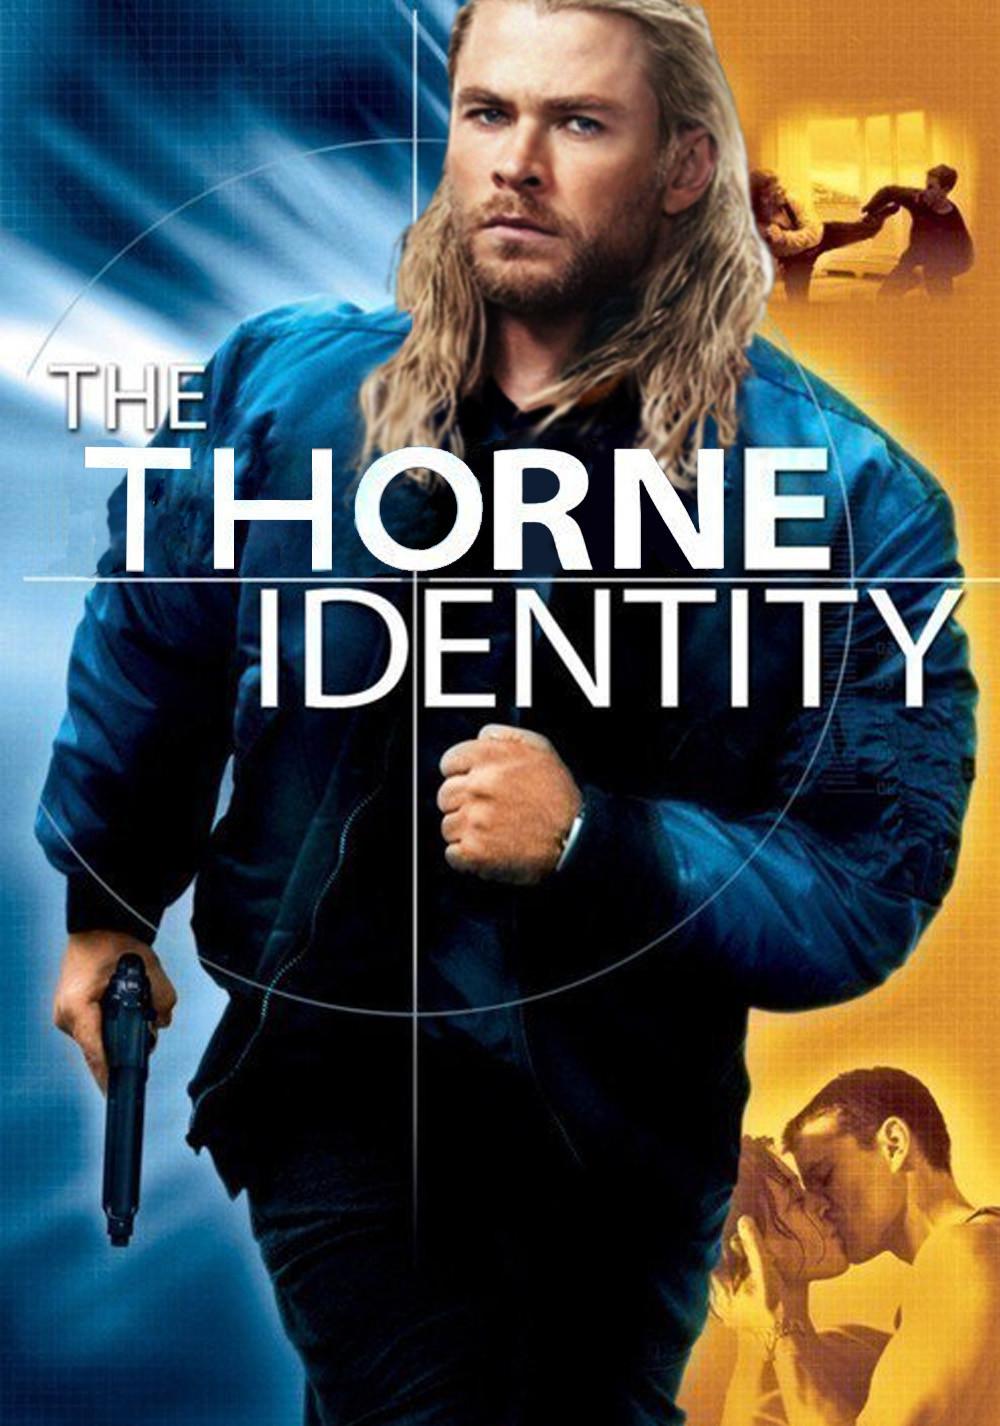 Thorne Identity.jpg